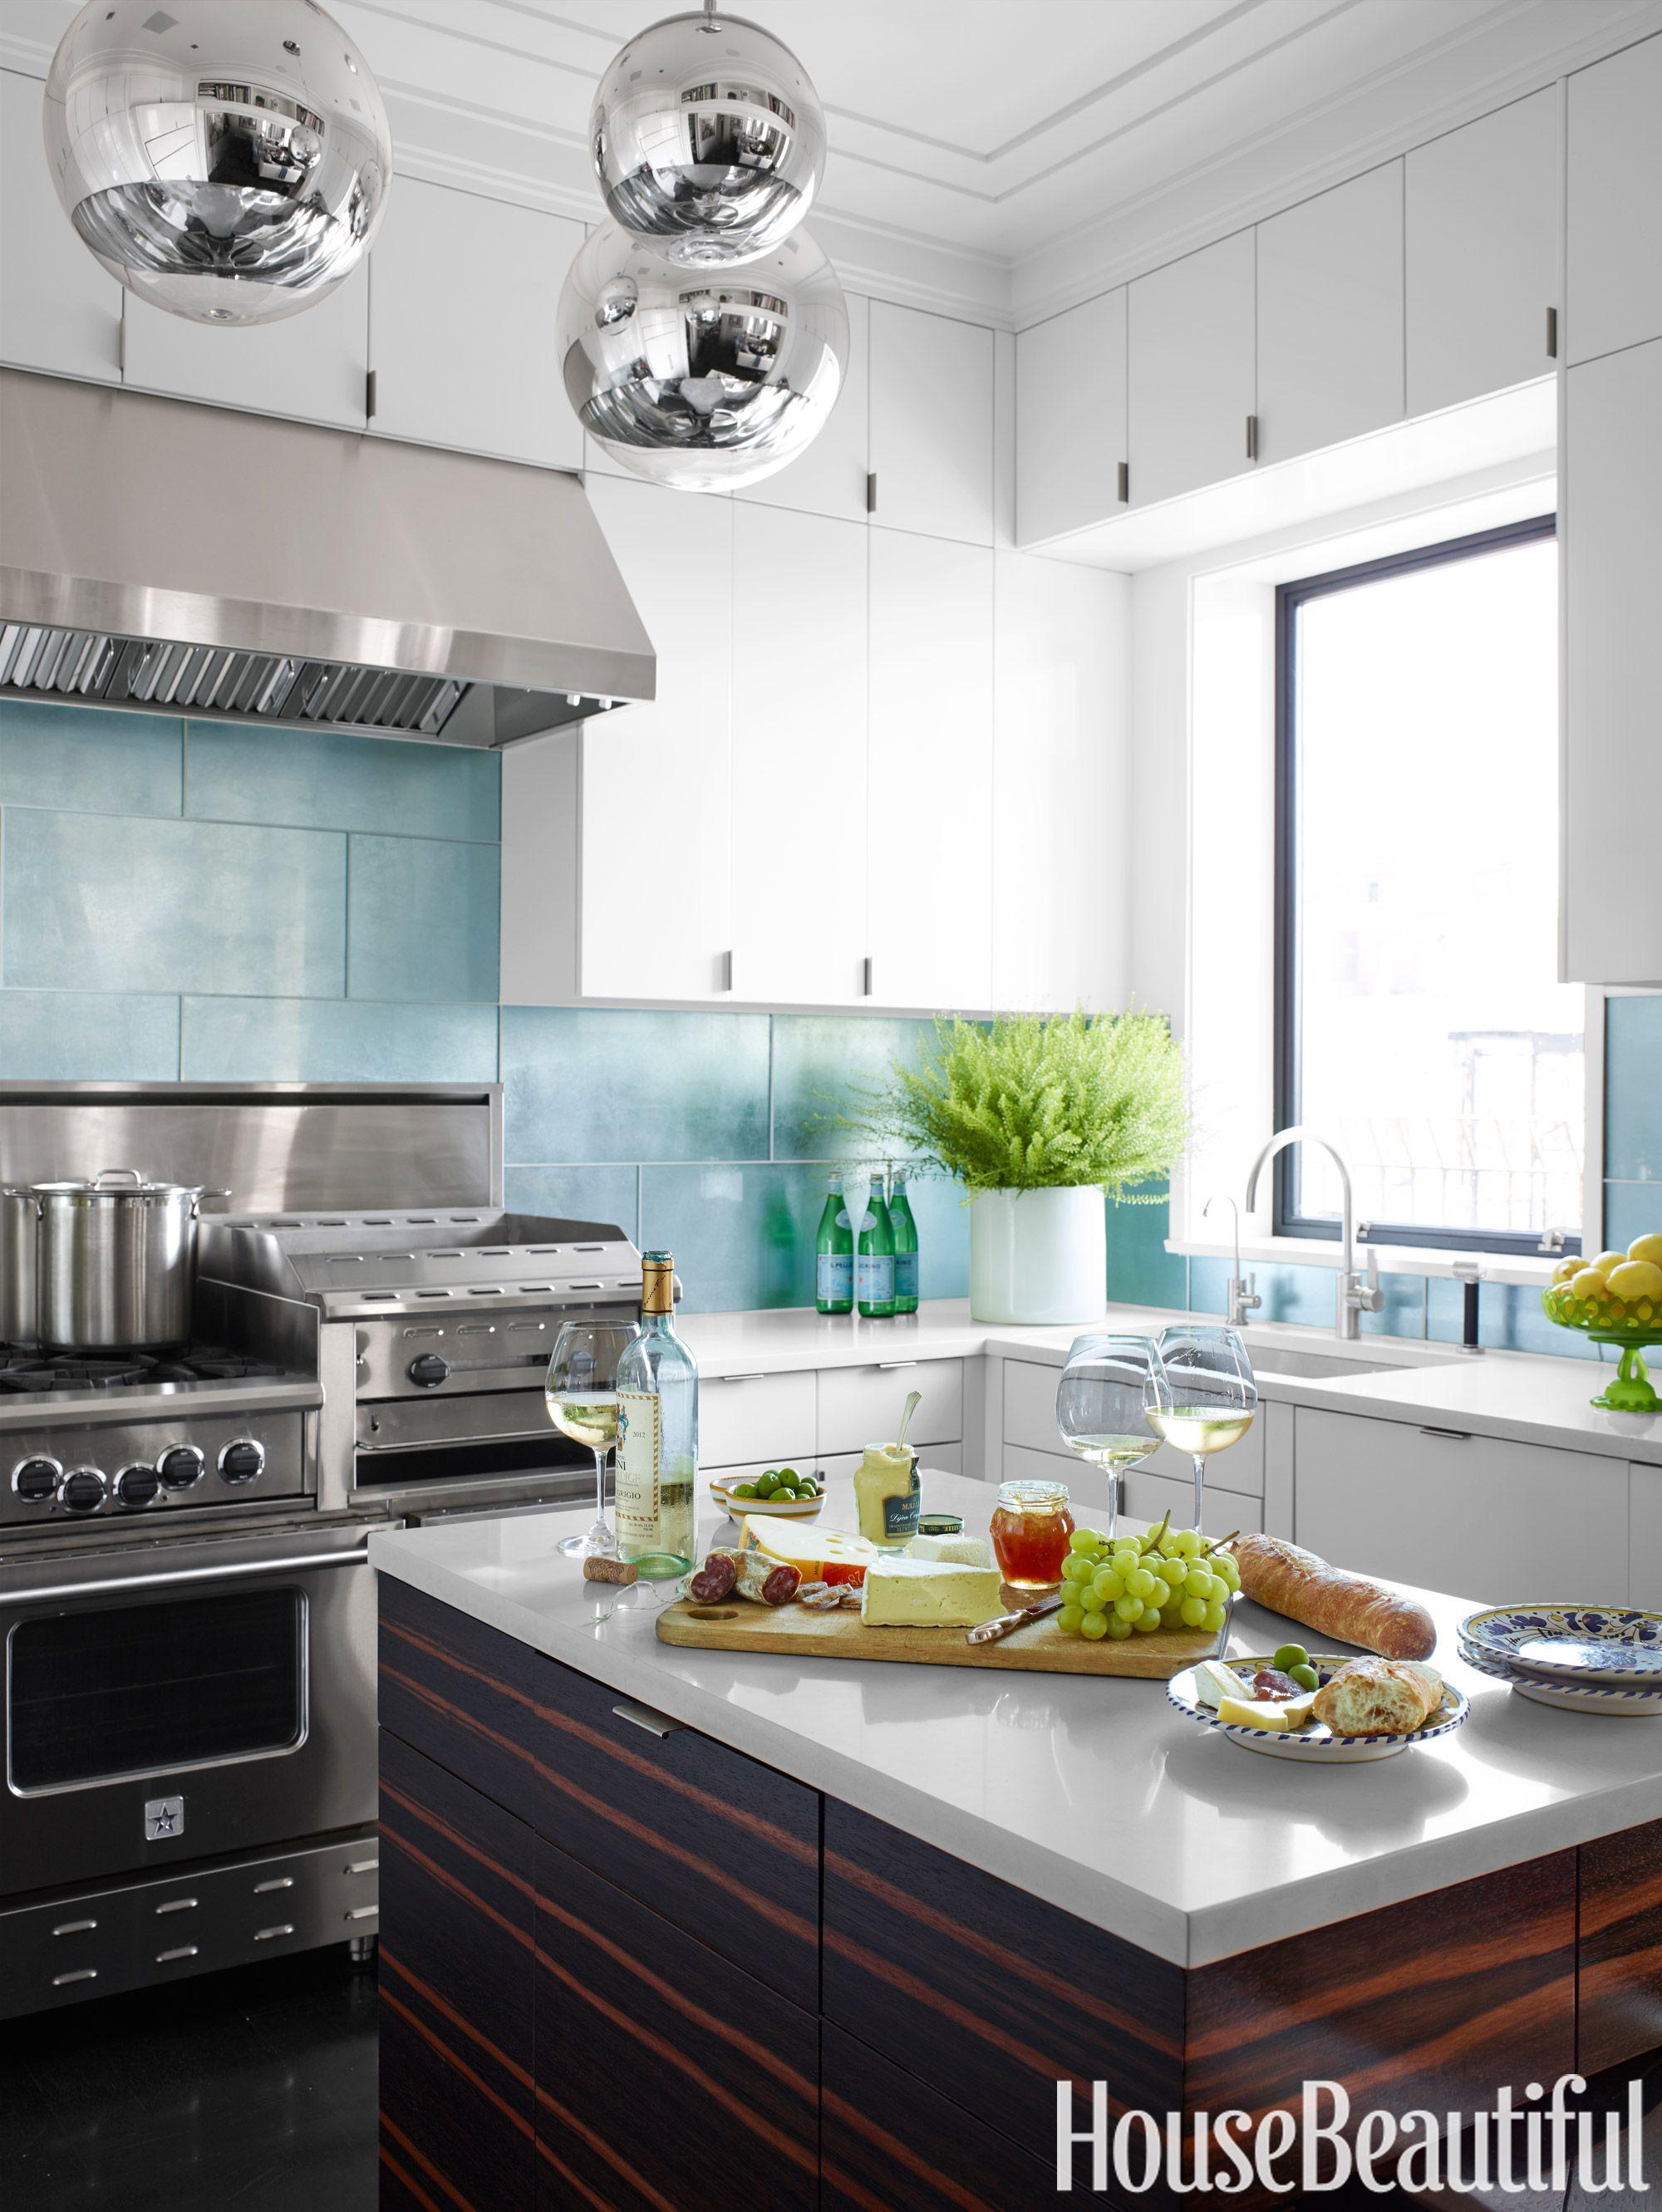 50 Impossibly Chic Kitchen Backsplashes  Open Floor Mirror Ball Classy New Modern Kitchen Design Inspiration